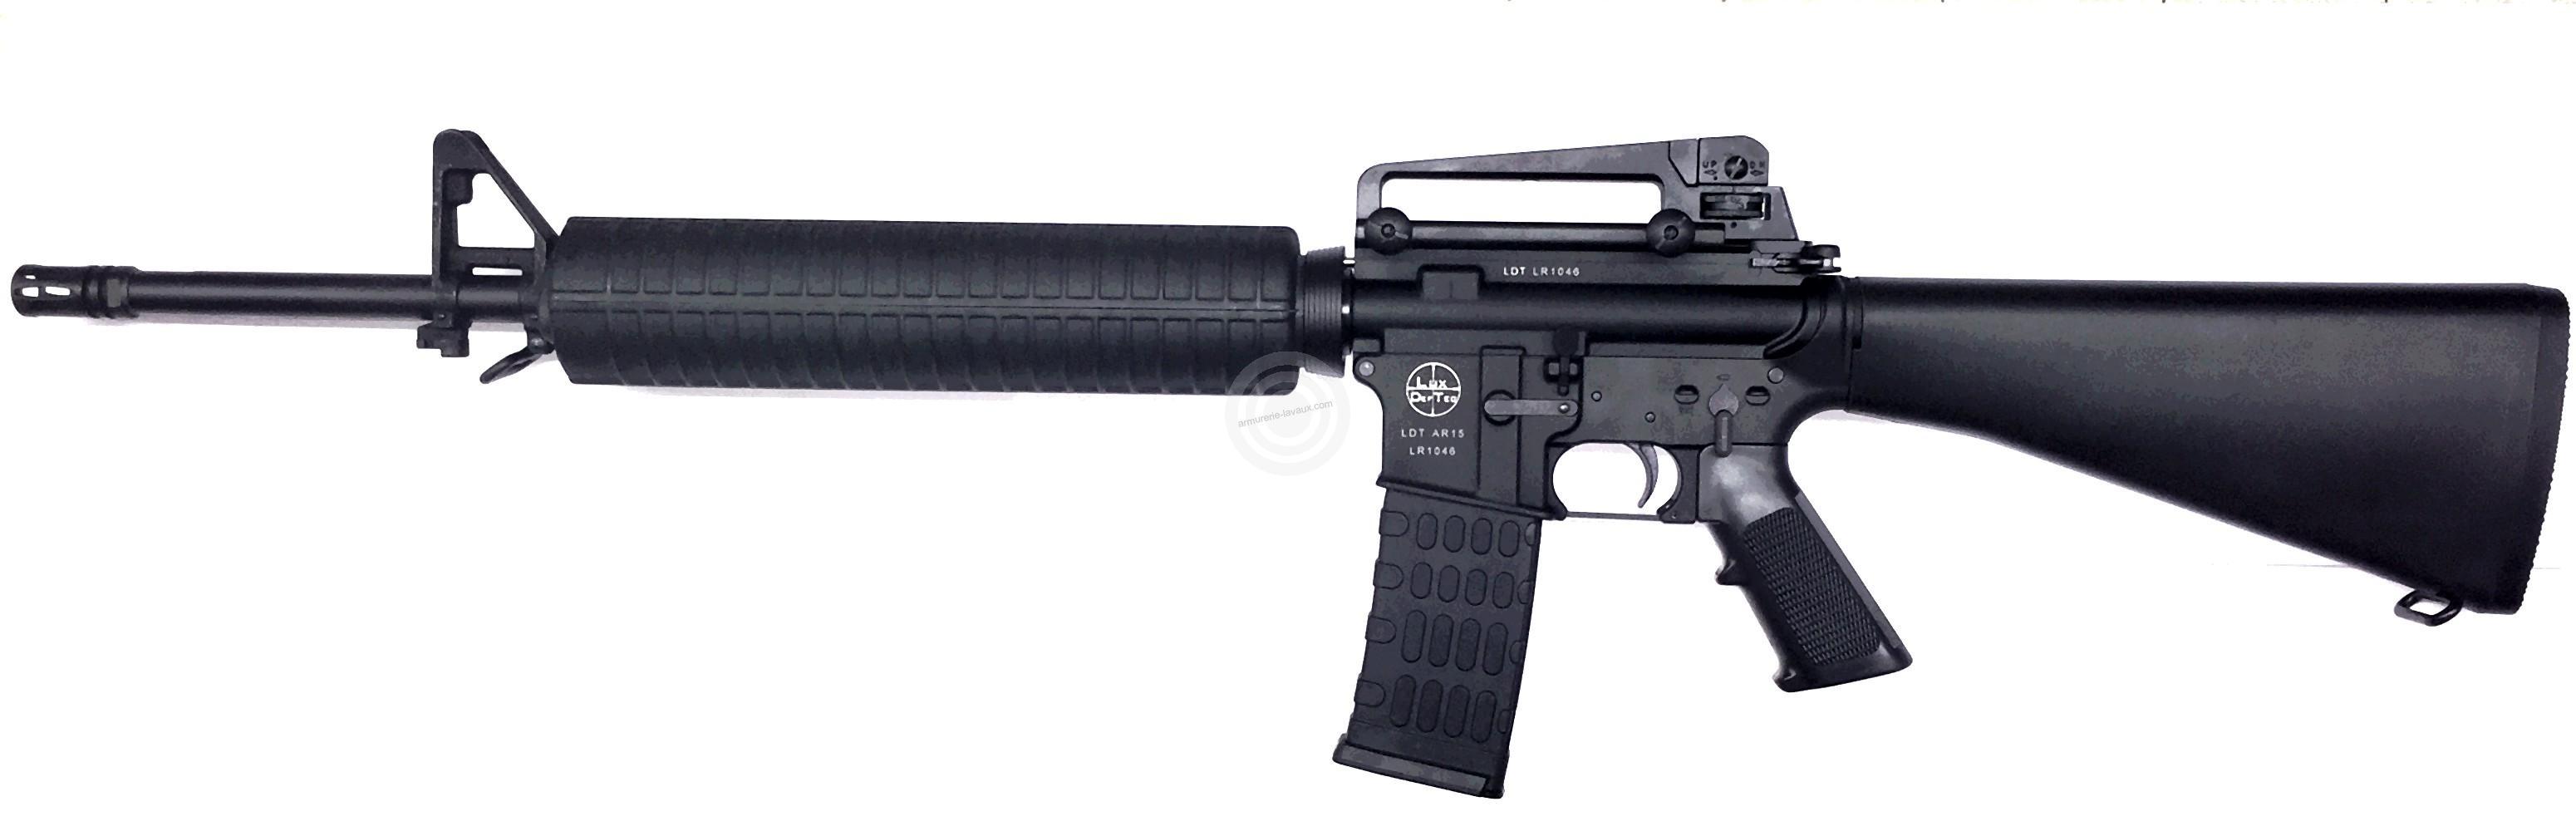 LDT AR15 M4 T.A.R 20